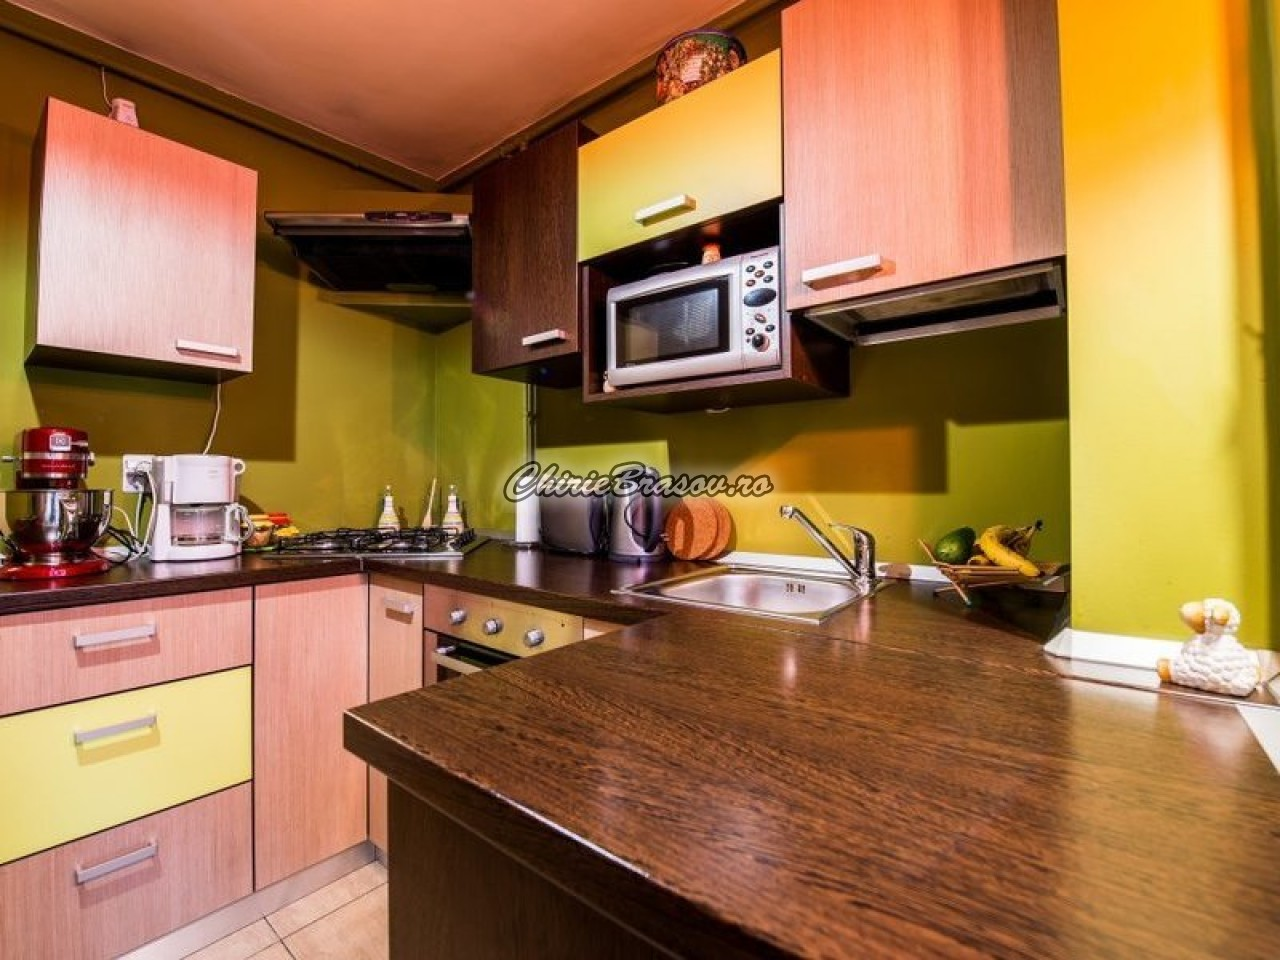 Inchiriere apartament 2 camere Brasov , Central - Grivitei-353-6